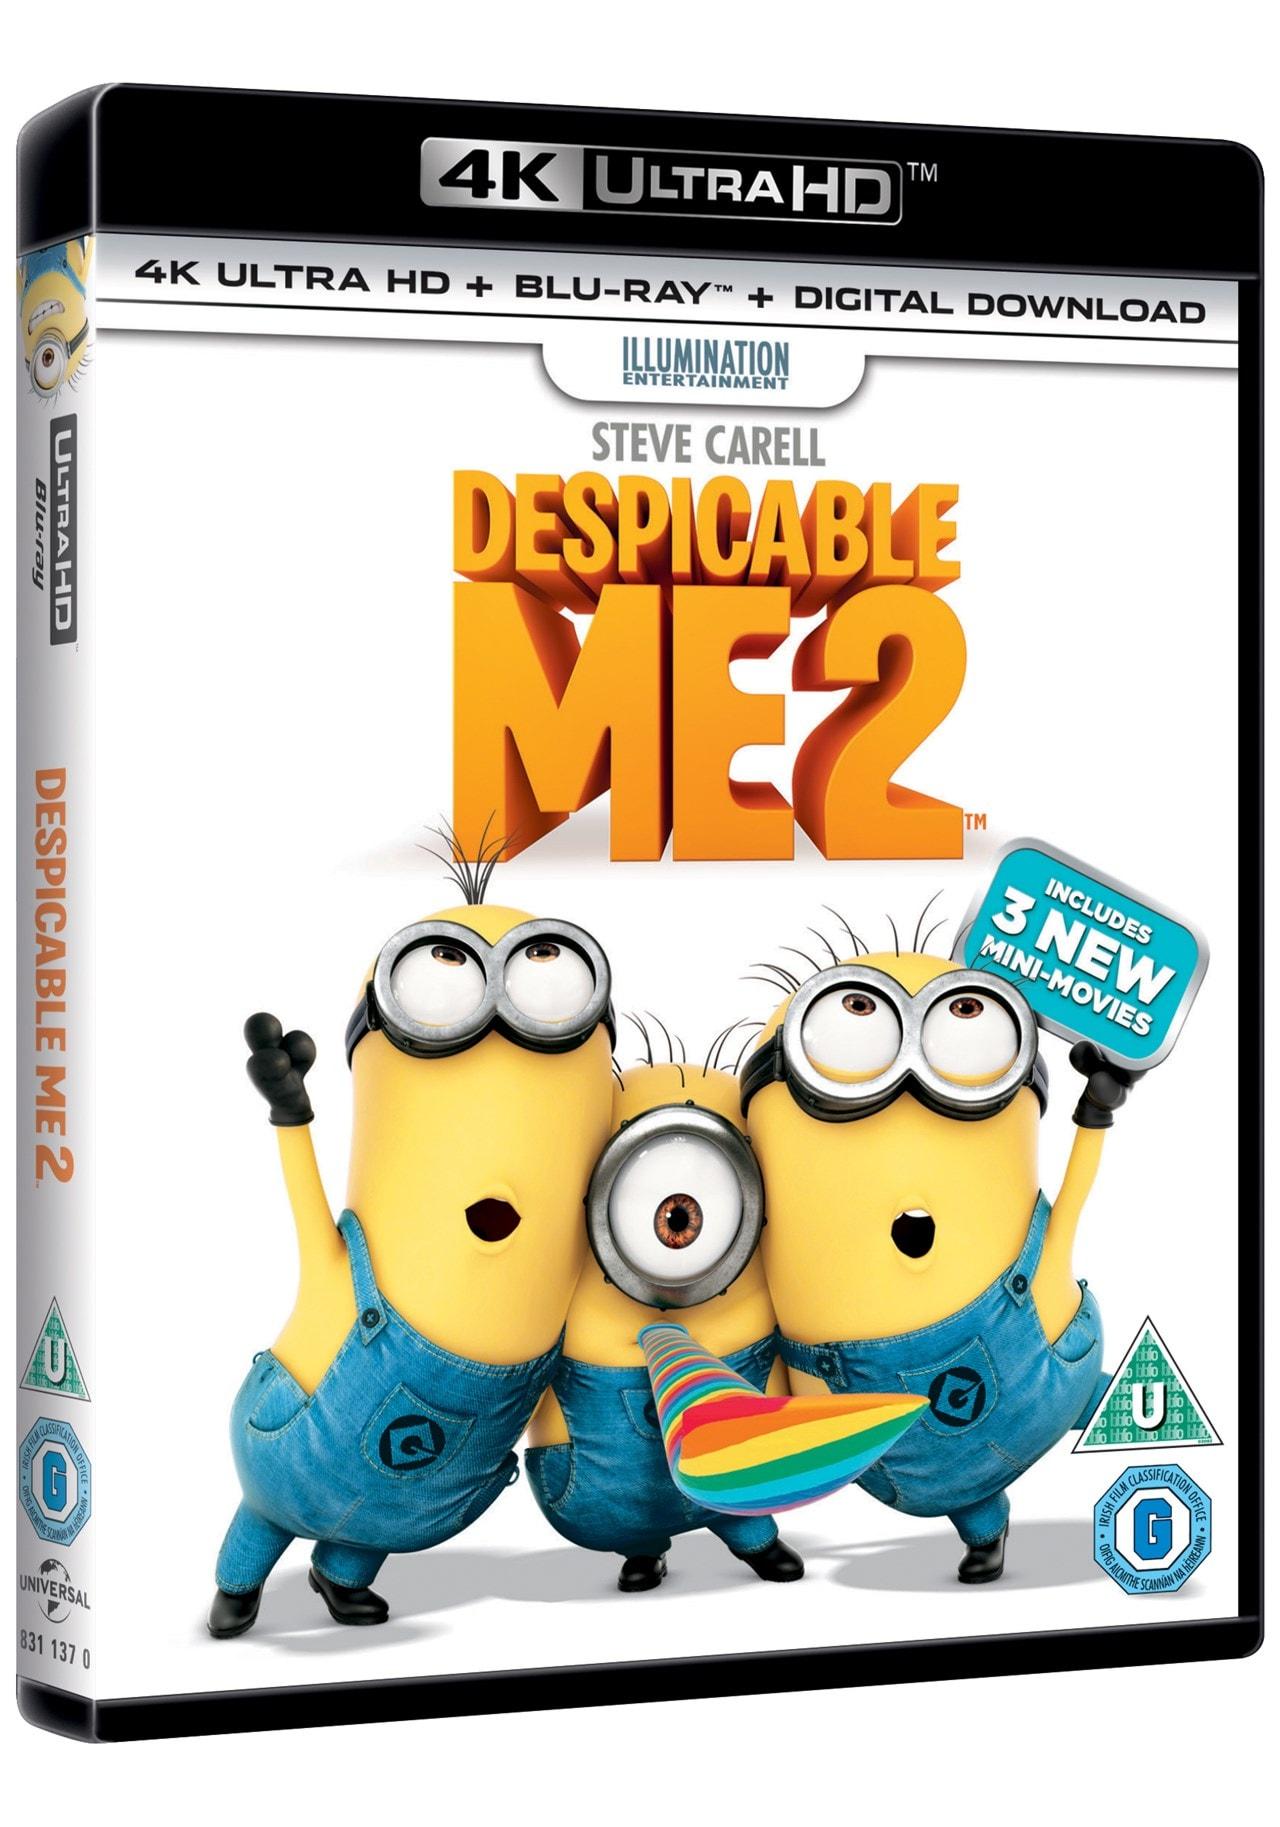 Despicable Me 2 - 2